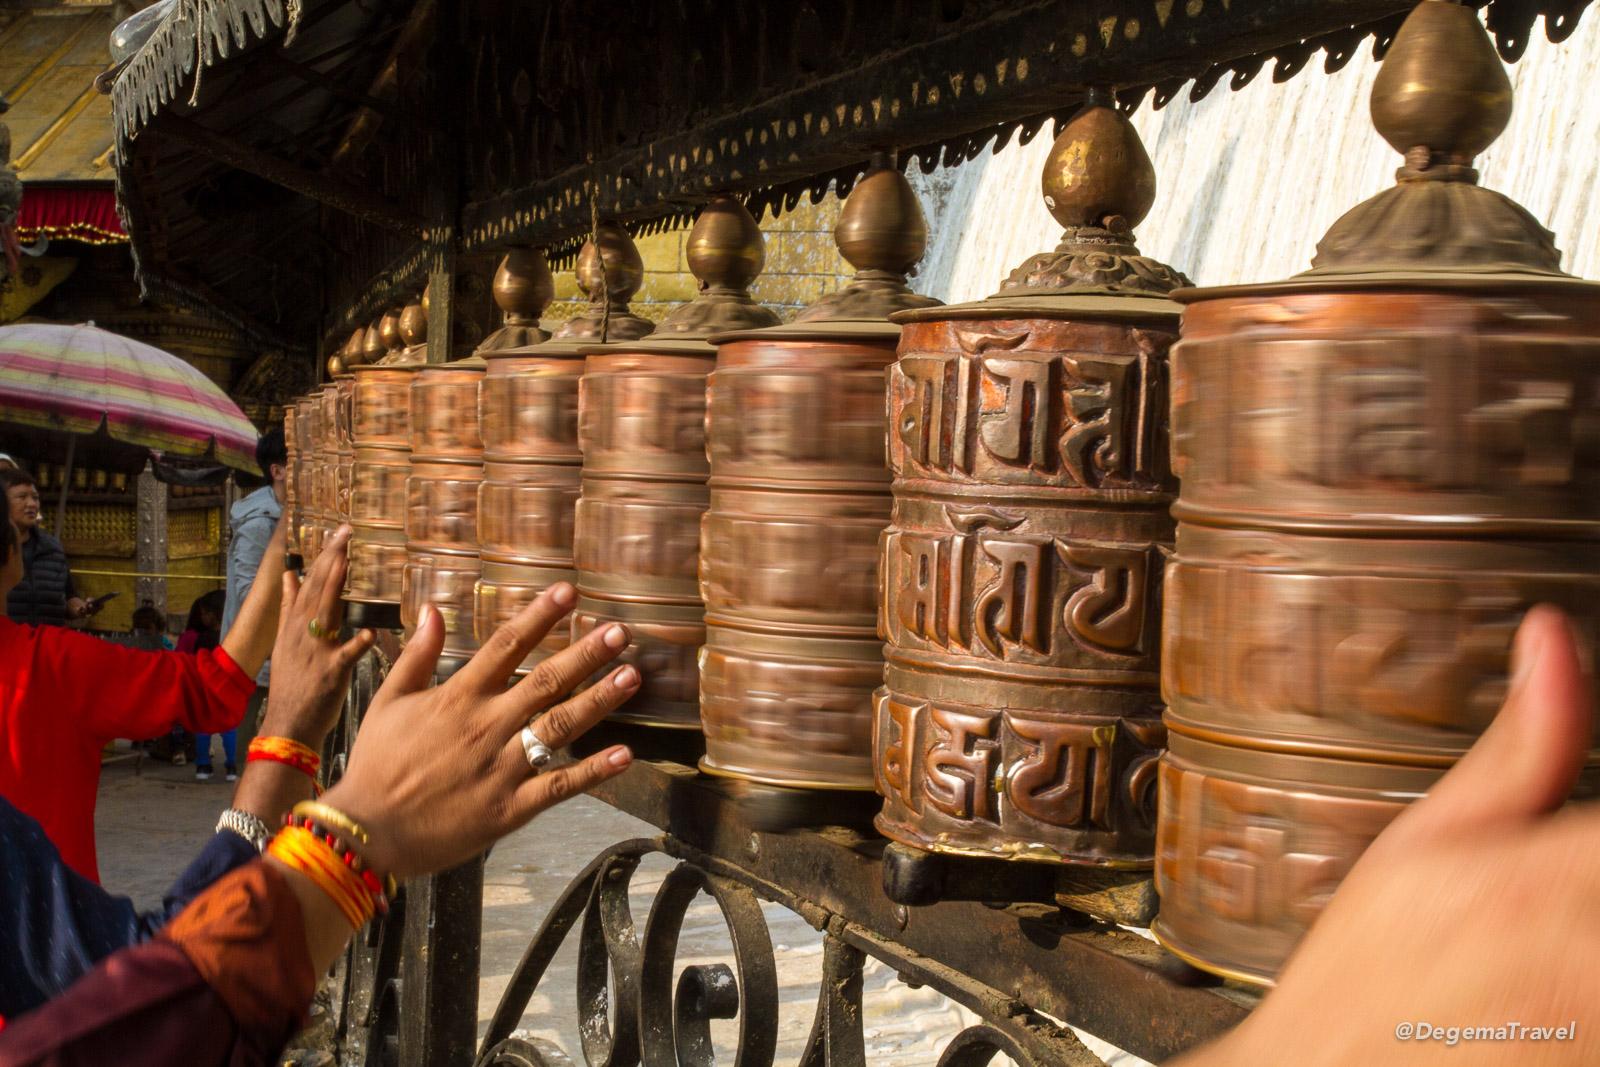 Mani wheels at Swayambhu Temple in Kathmandu, Nepal